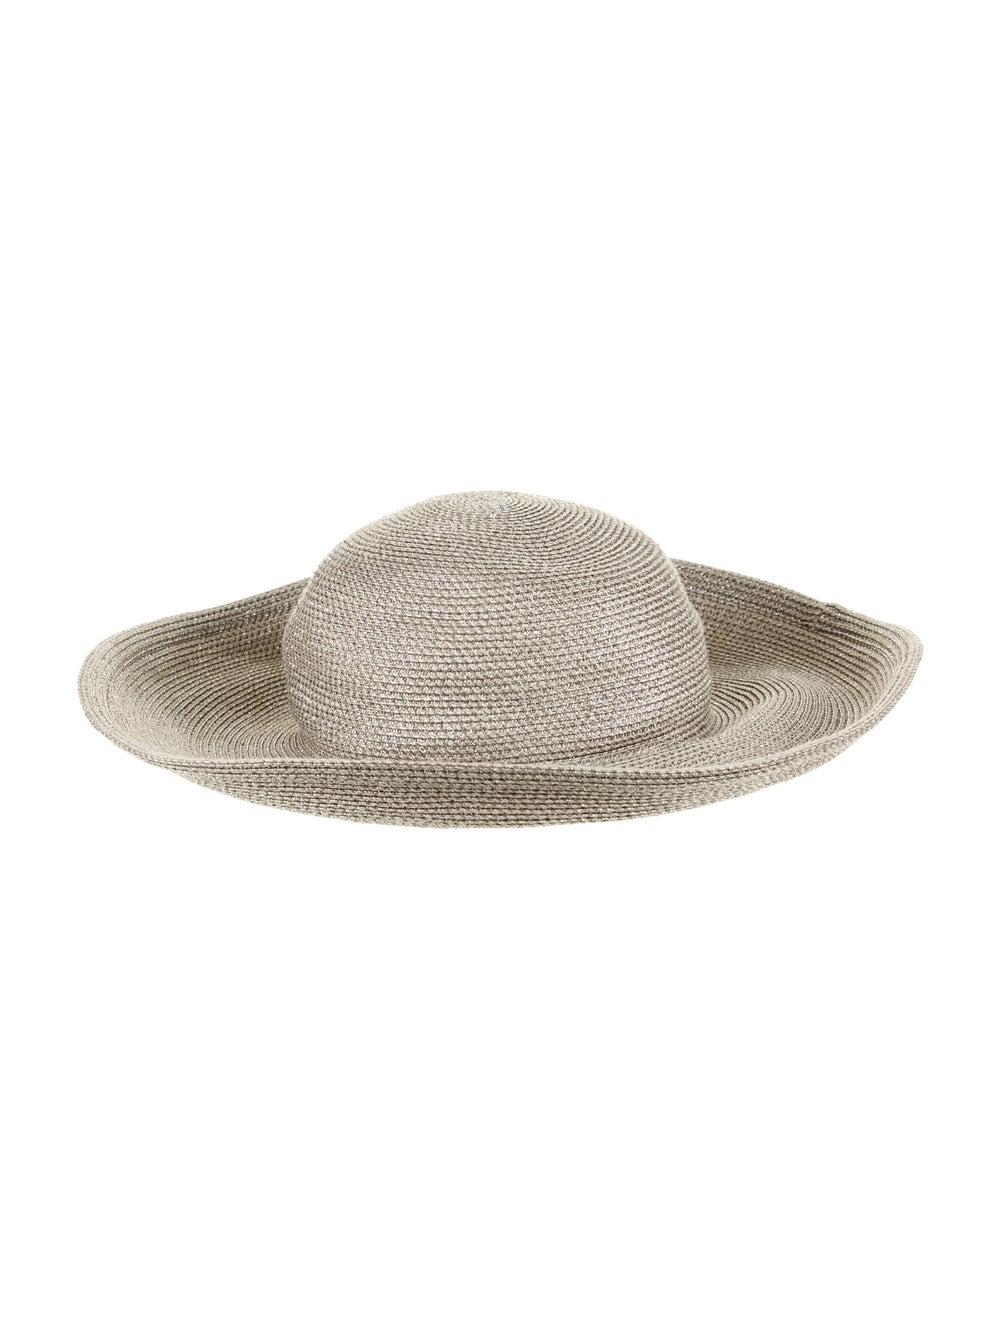 Eric Javits Straw Sun Hat metallic - image 2